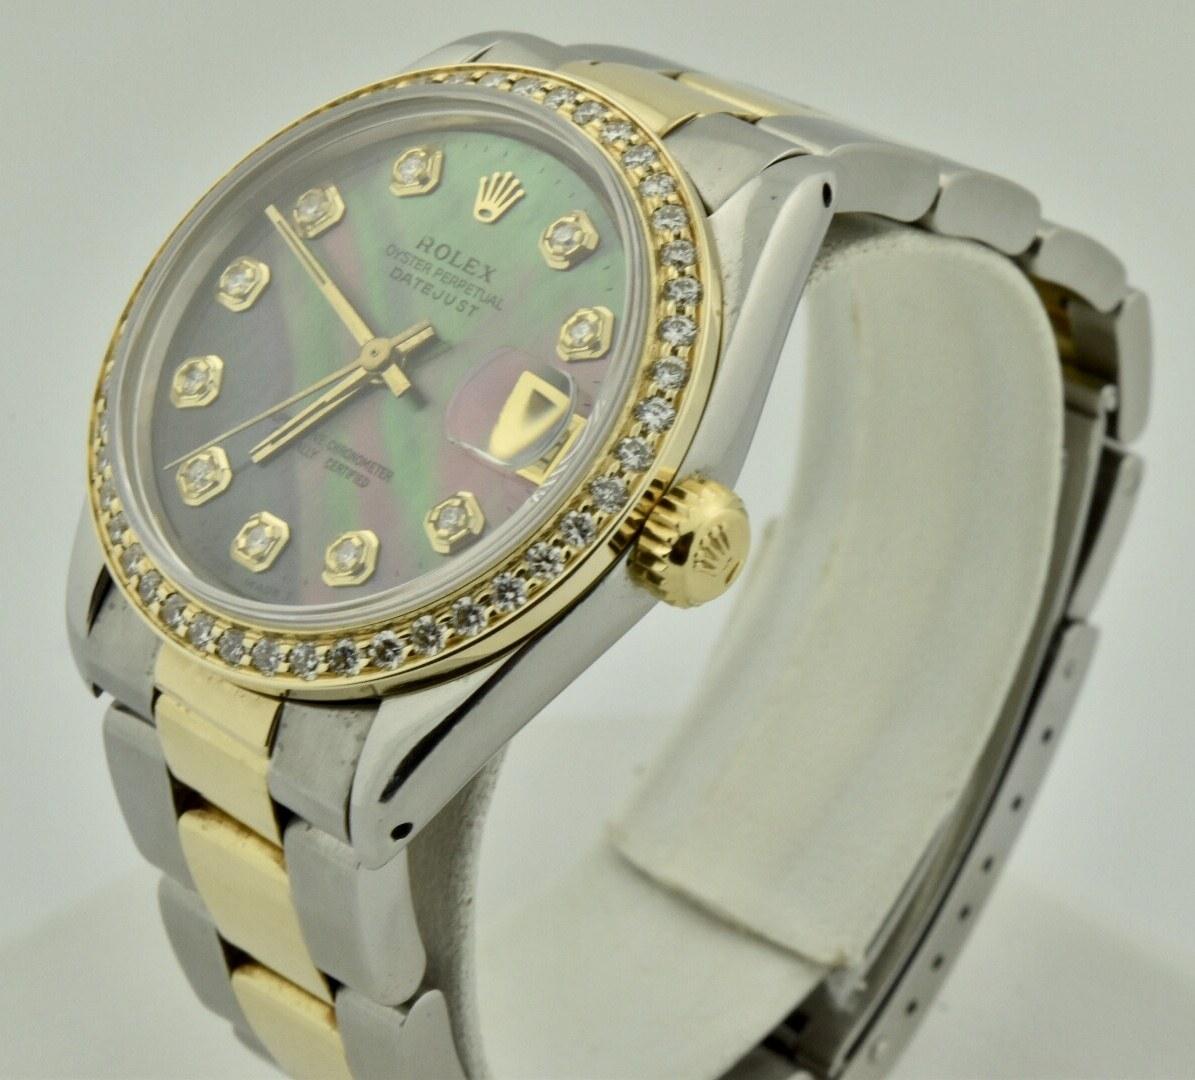 IMG 7089 2 - Rolex Datejust Midsize